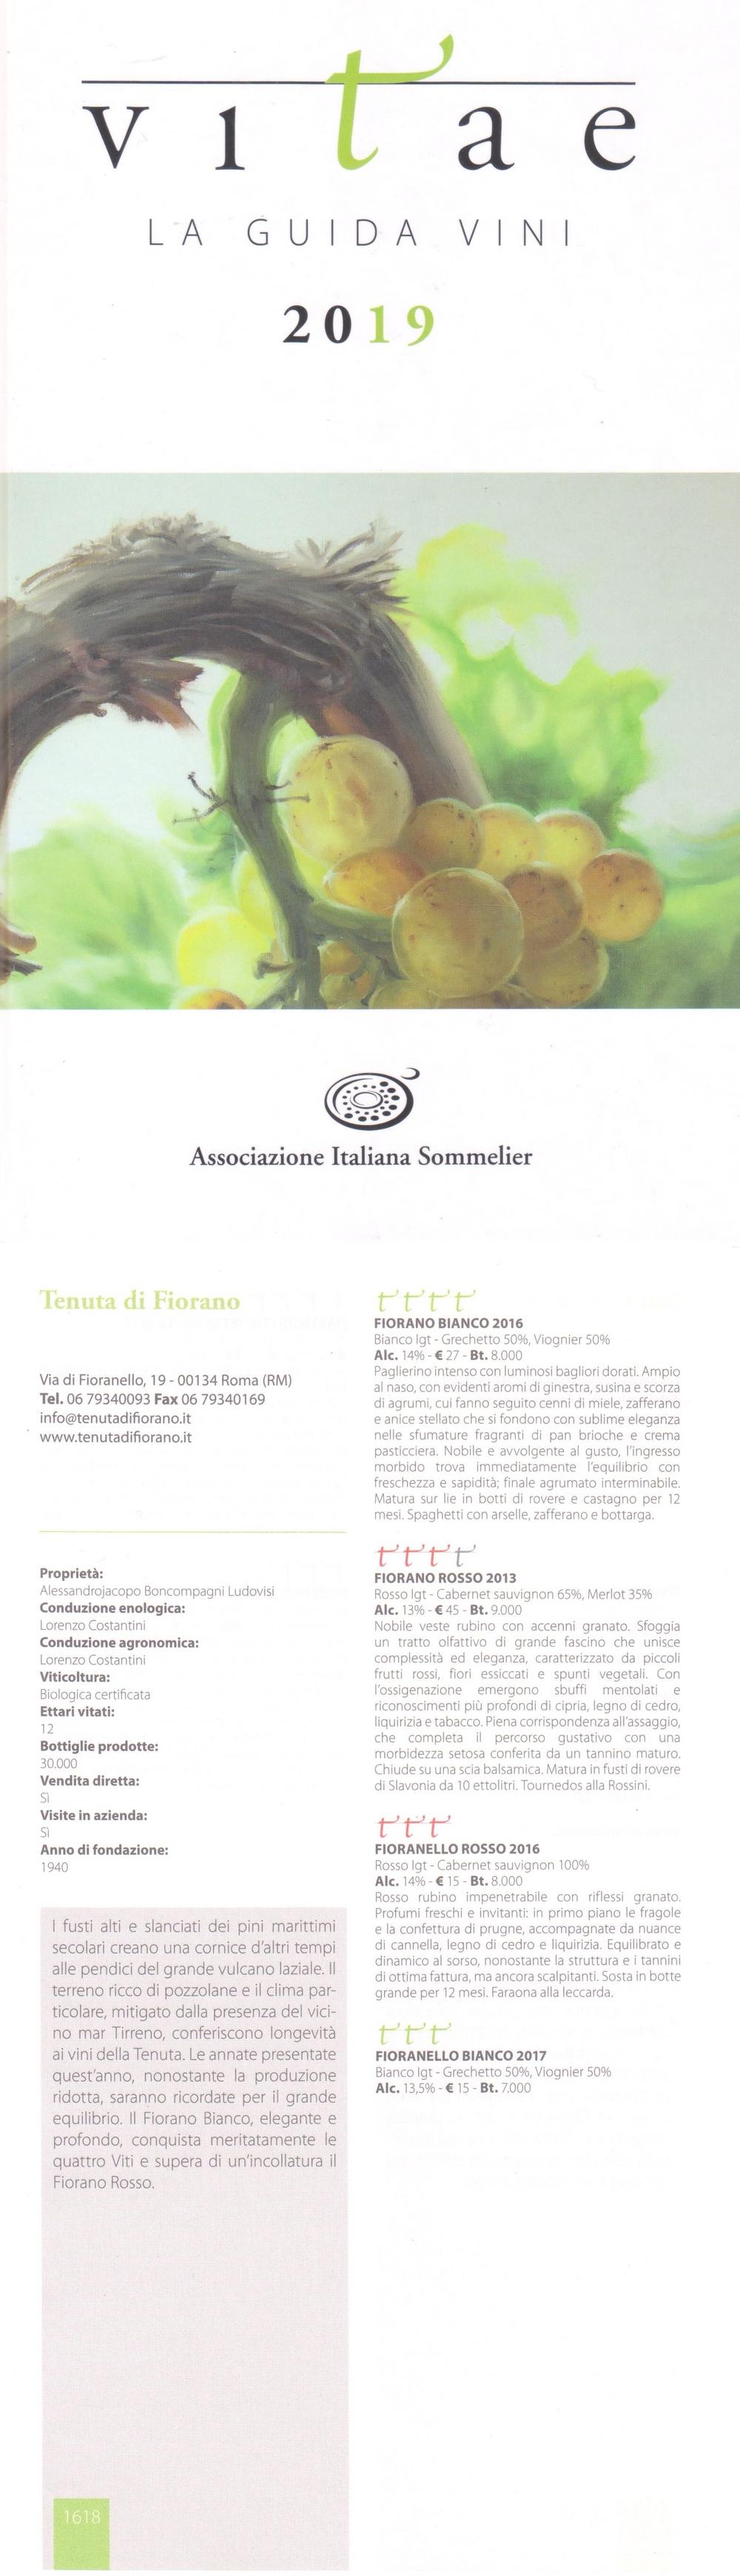 TENUTA DI FIORANO - VITAE 2019 - GUIDA ASSOCIAZIONE ITALIANA SOMMELIER